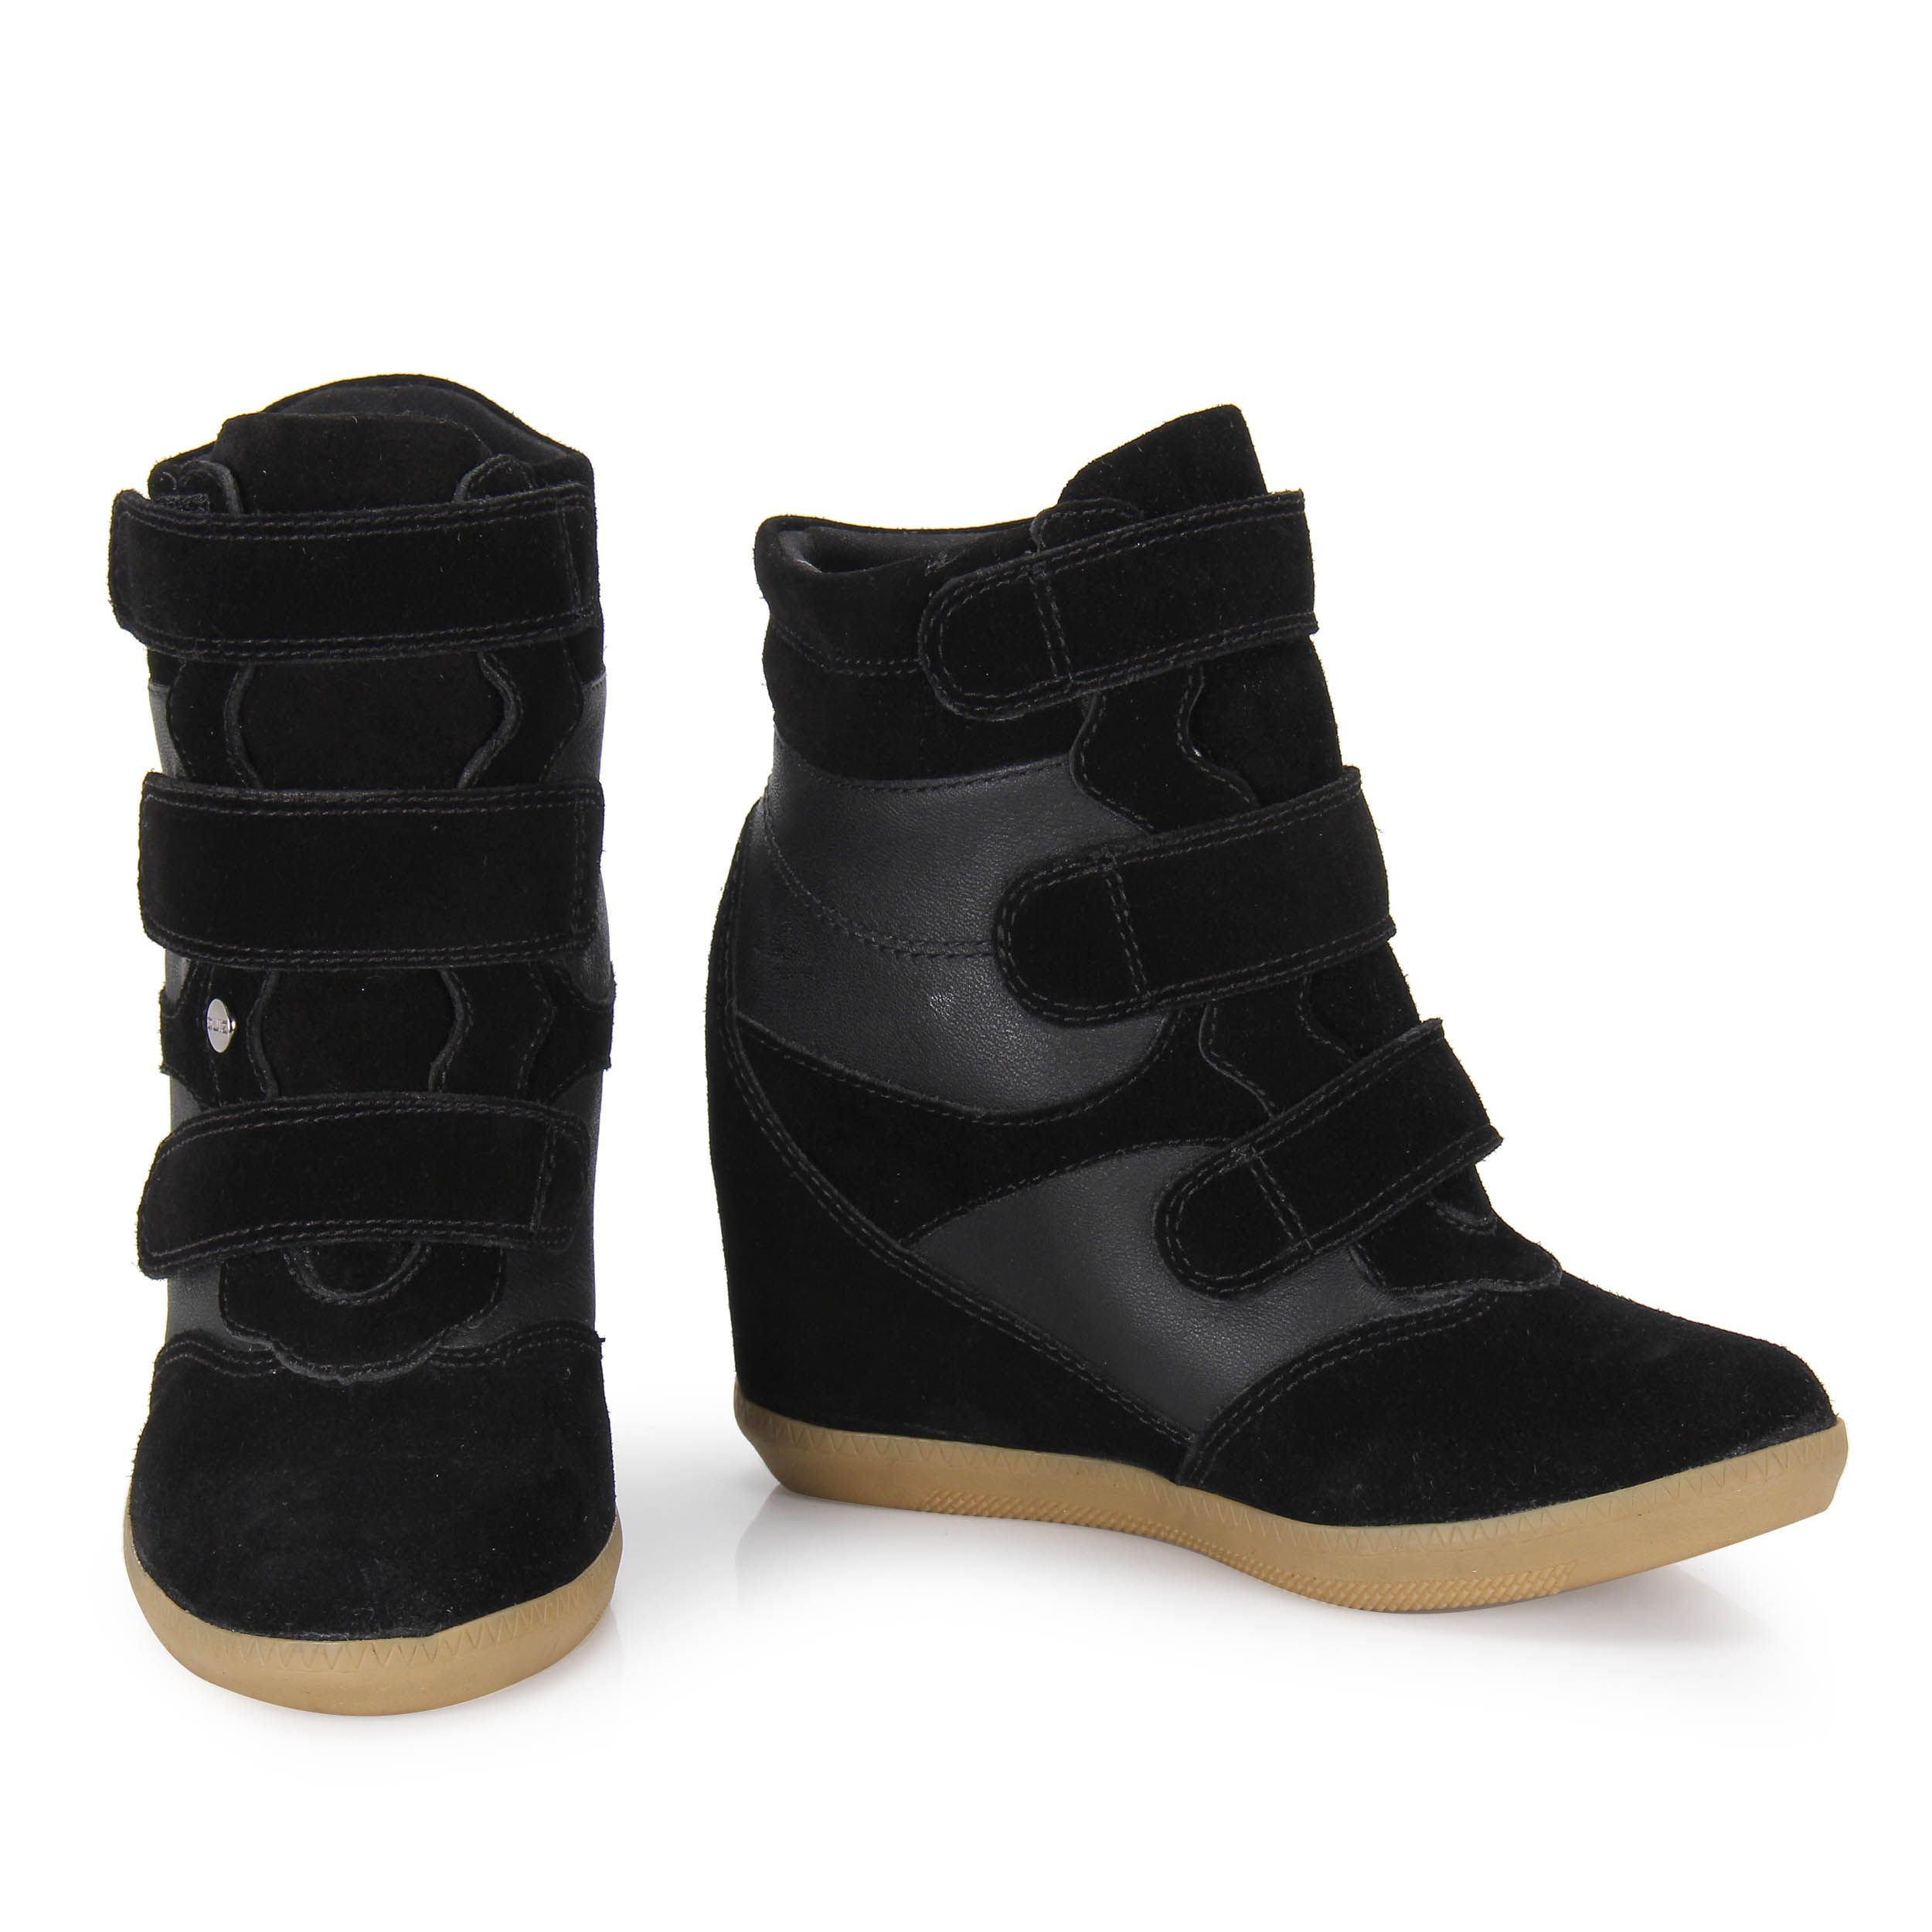 Tênis Sneaker Feminino Preto   Para Usar e customizar   Pinterest ... 9edf39c0ab